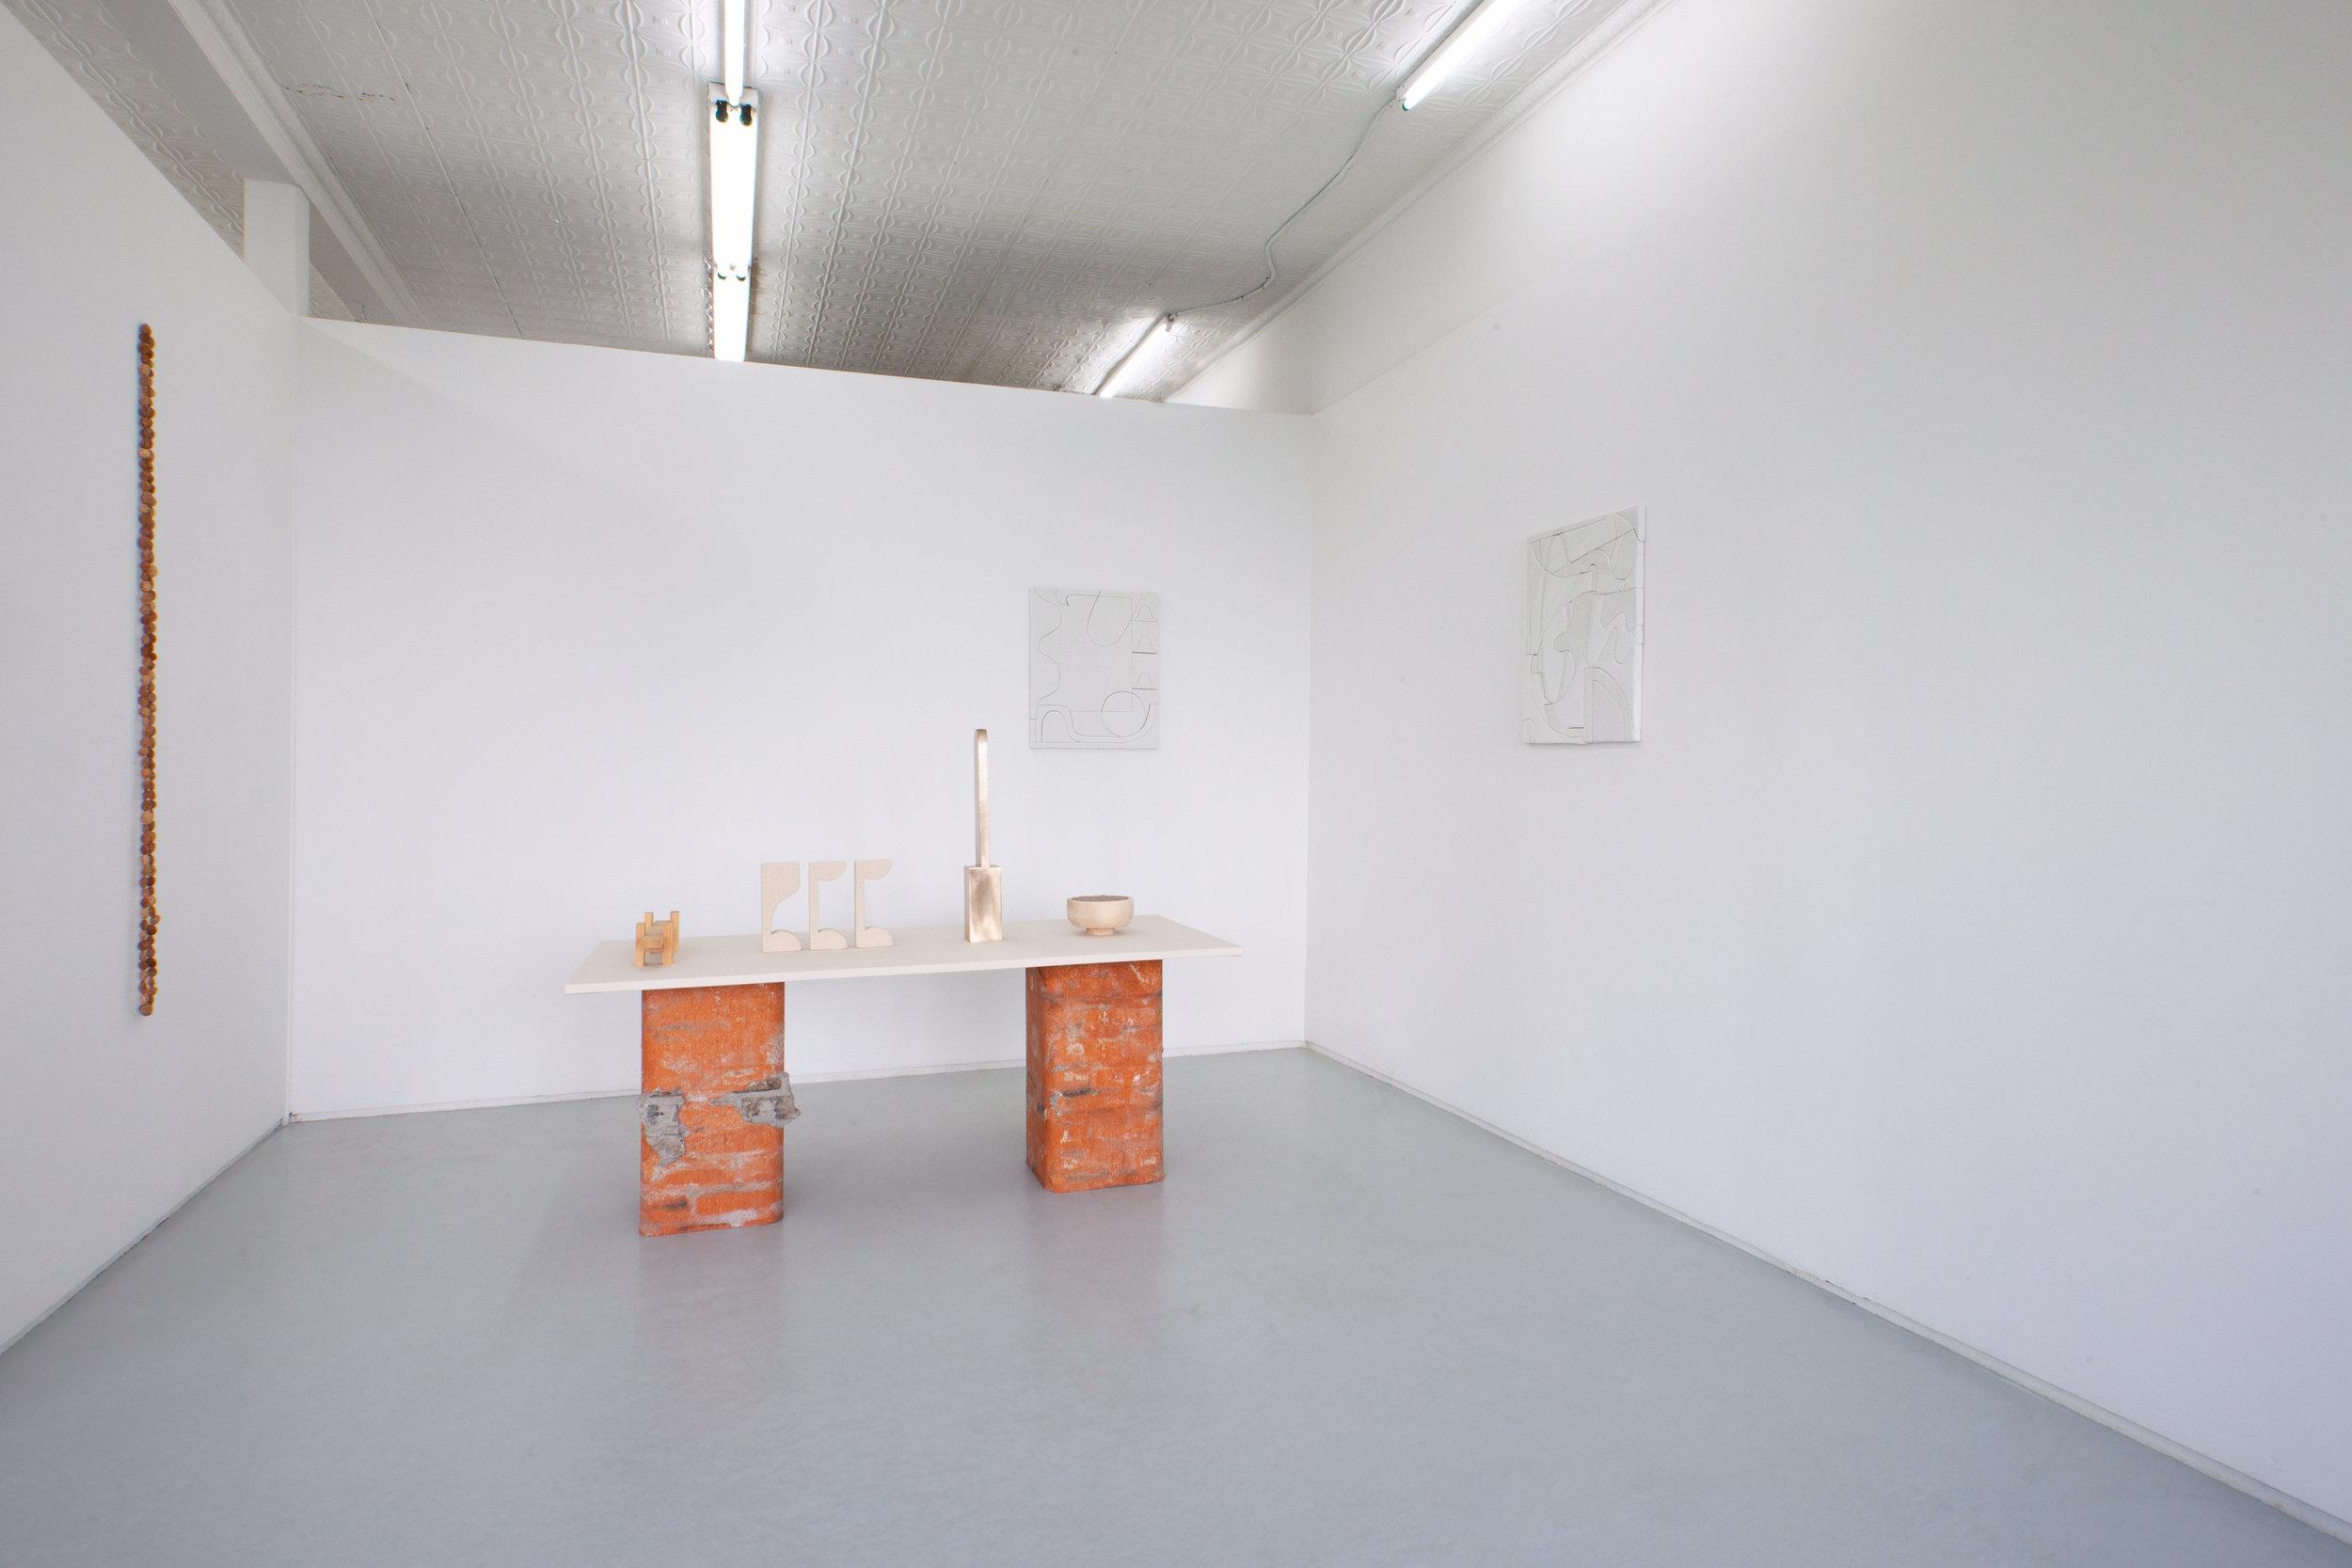 Elizabeth_Atterbury-Night_Comes_In-Installation_View_007.jpg